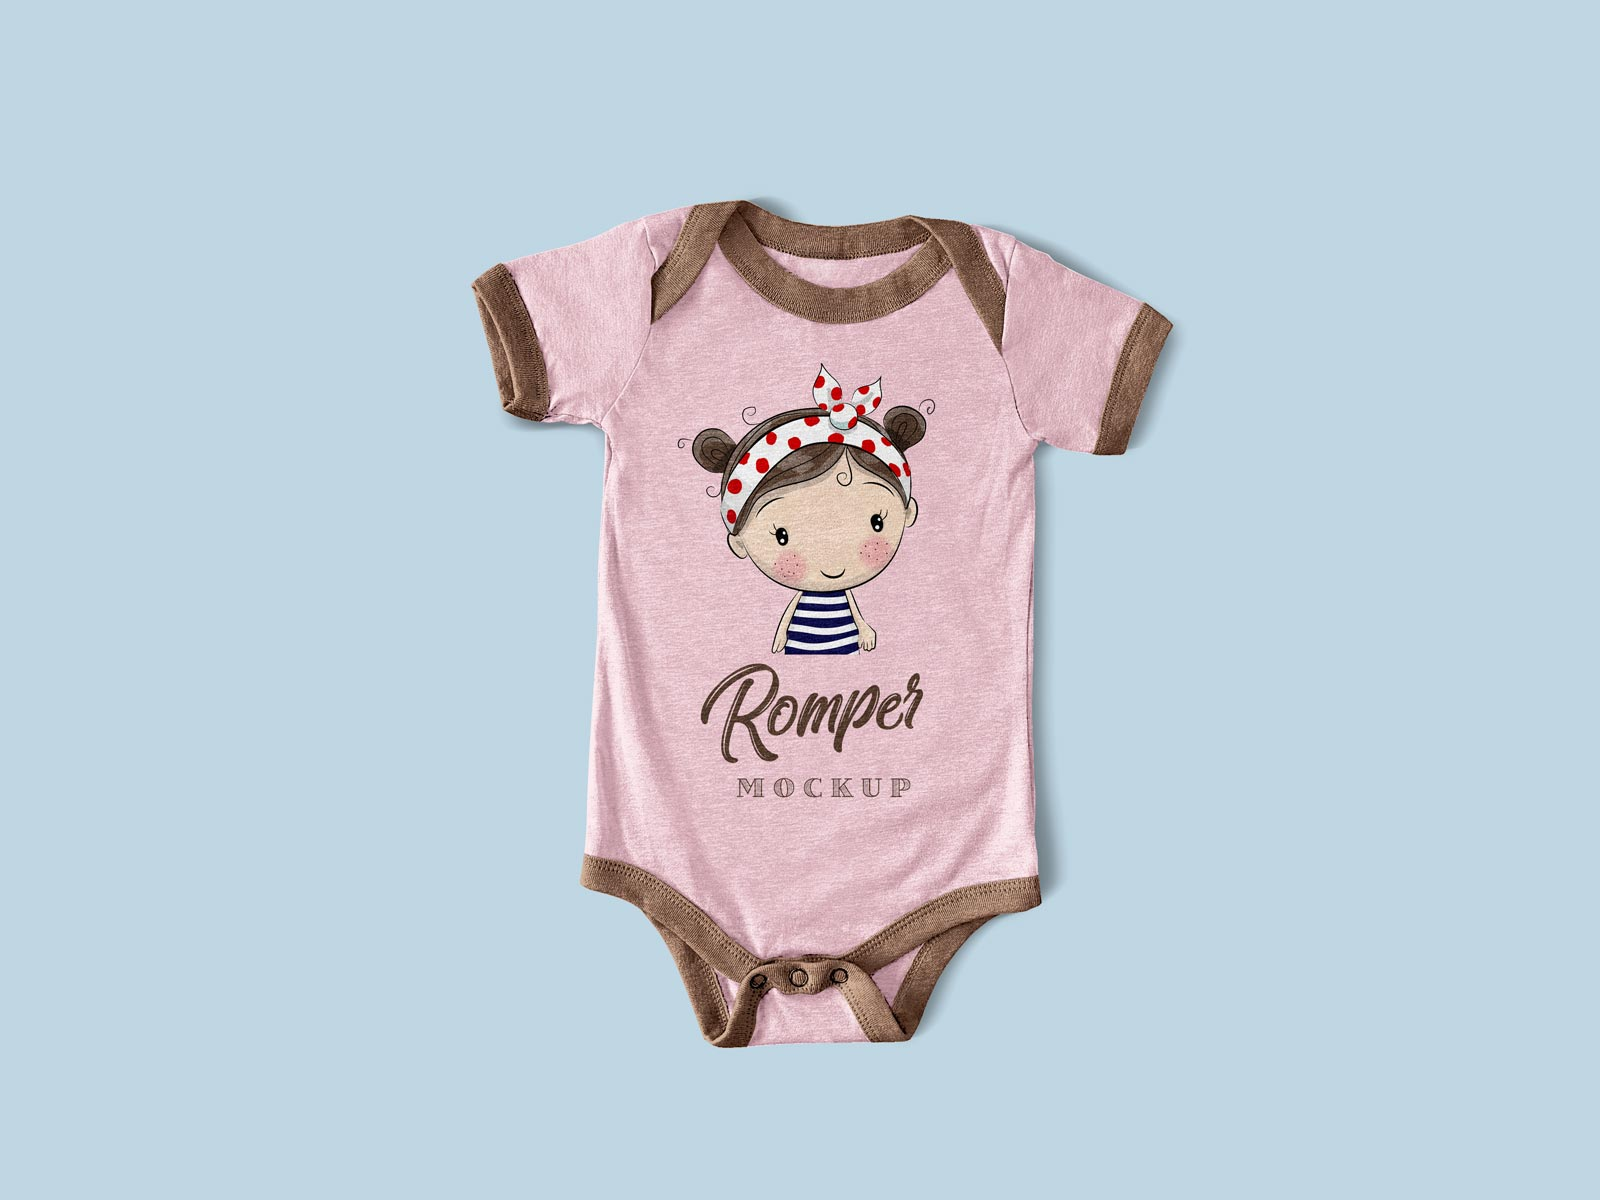 Free-Newborn-Baby-Onesie-Romper-Bodysuit-Mockup-PSD-File